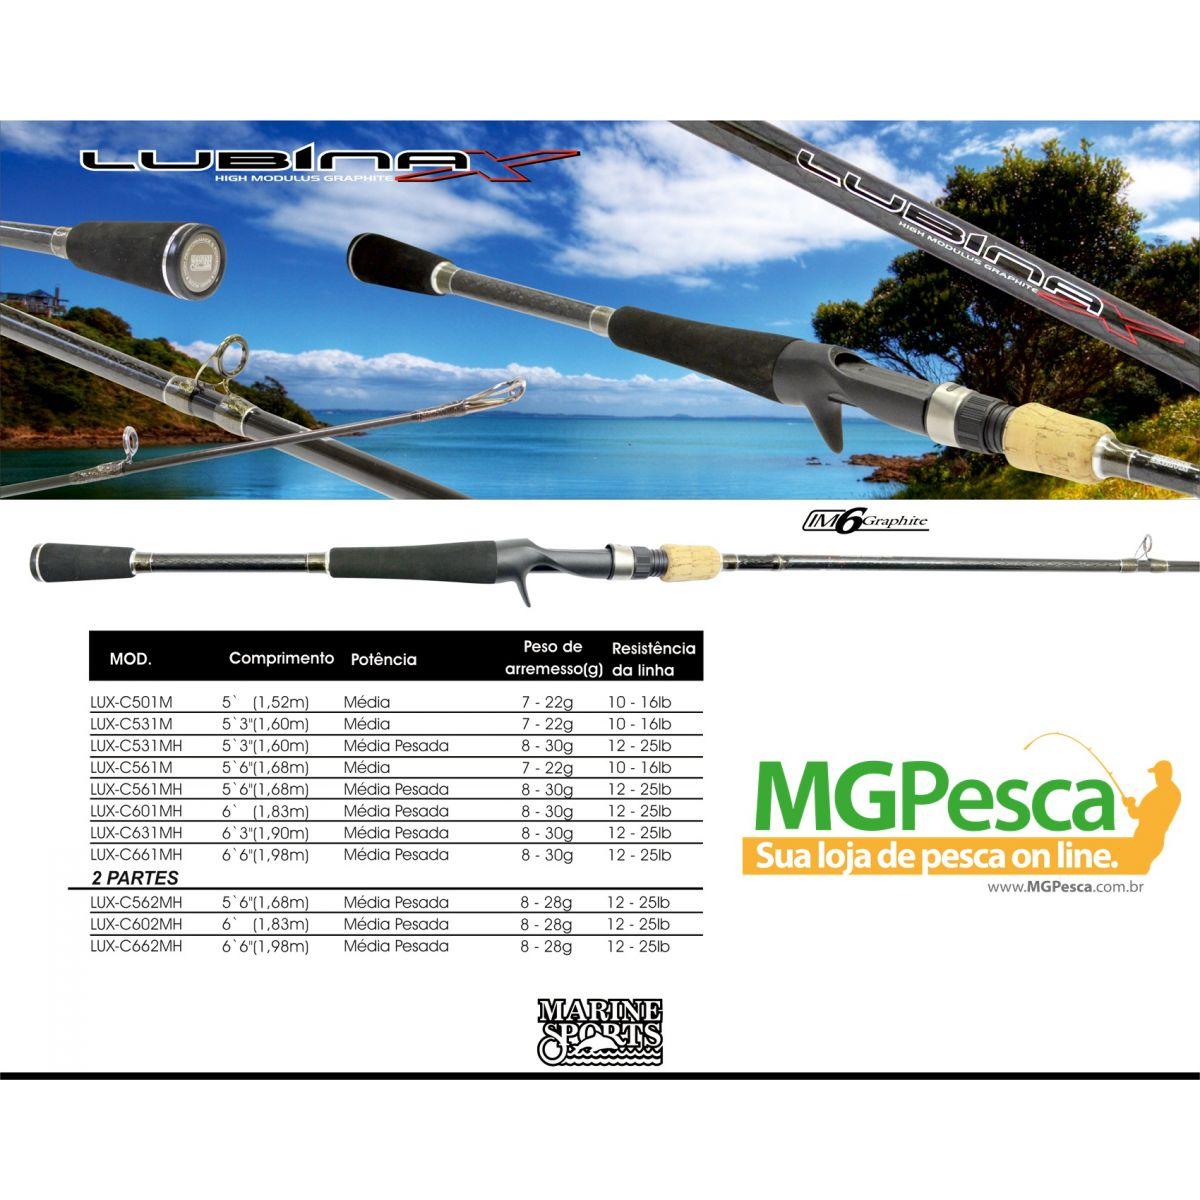 "Vara para carretilha Marine Sports Lubina X 6"" (1,83m) 25 Lbs - LUX-C602MH - 02 partes  - MGPesca"